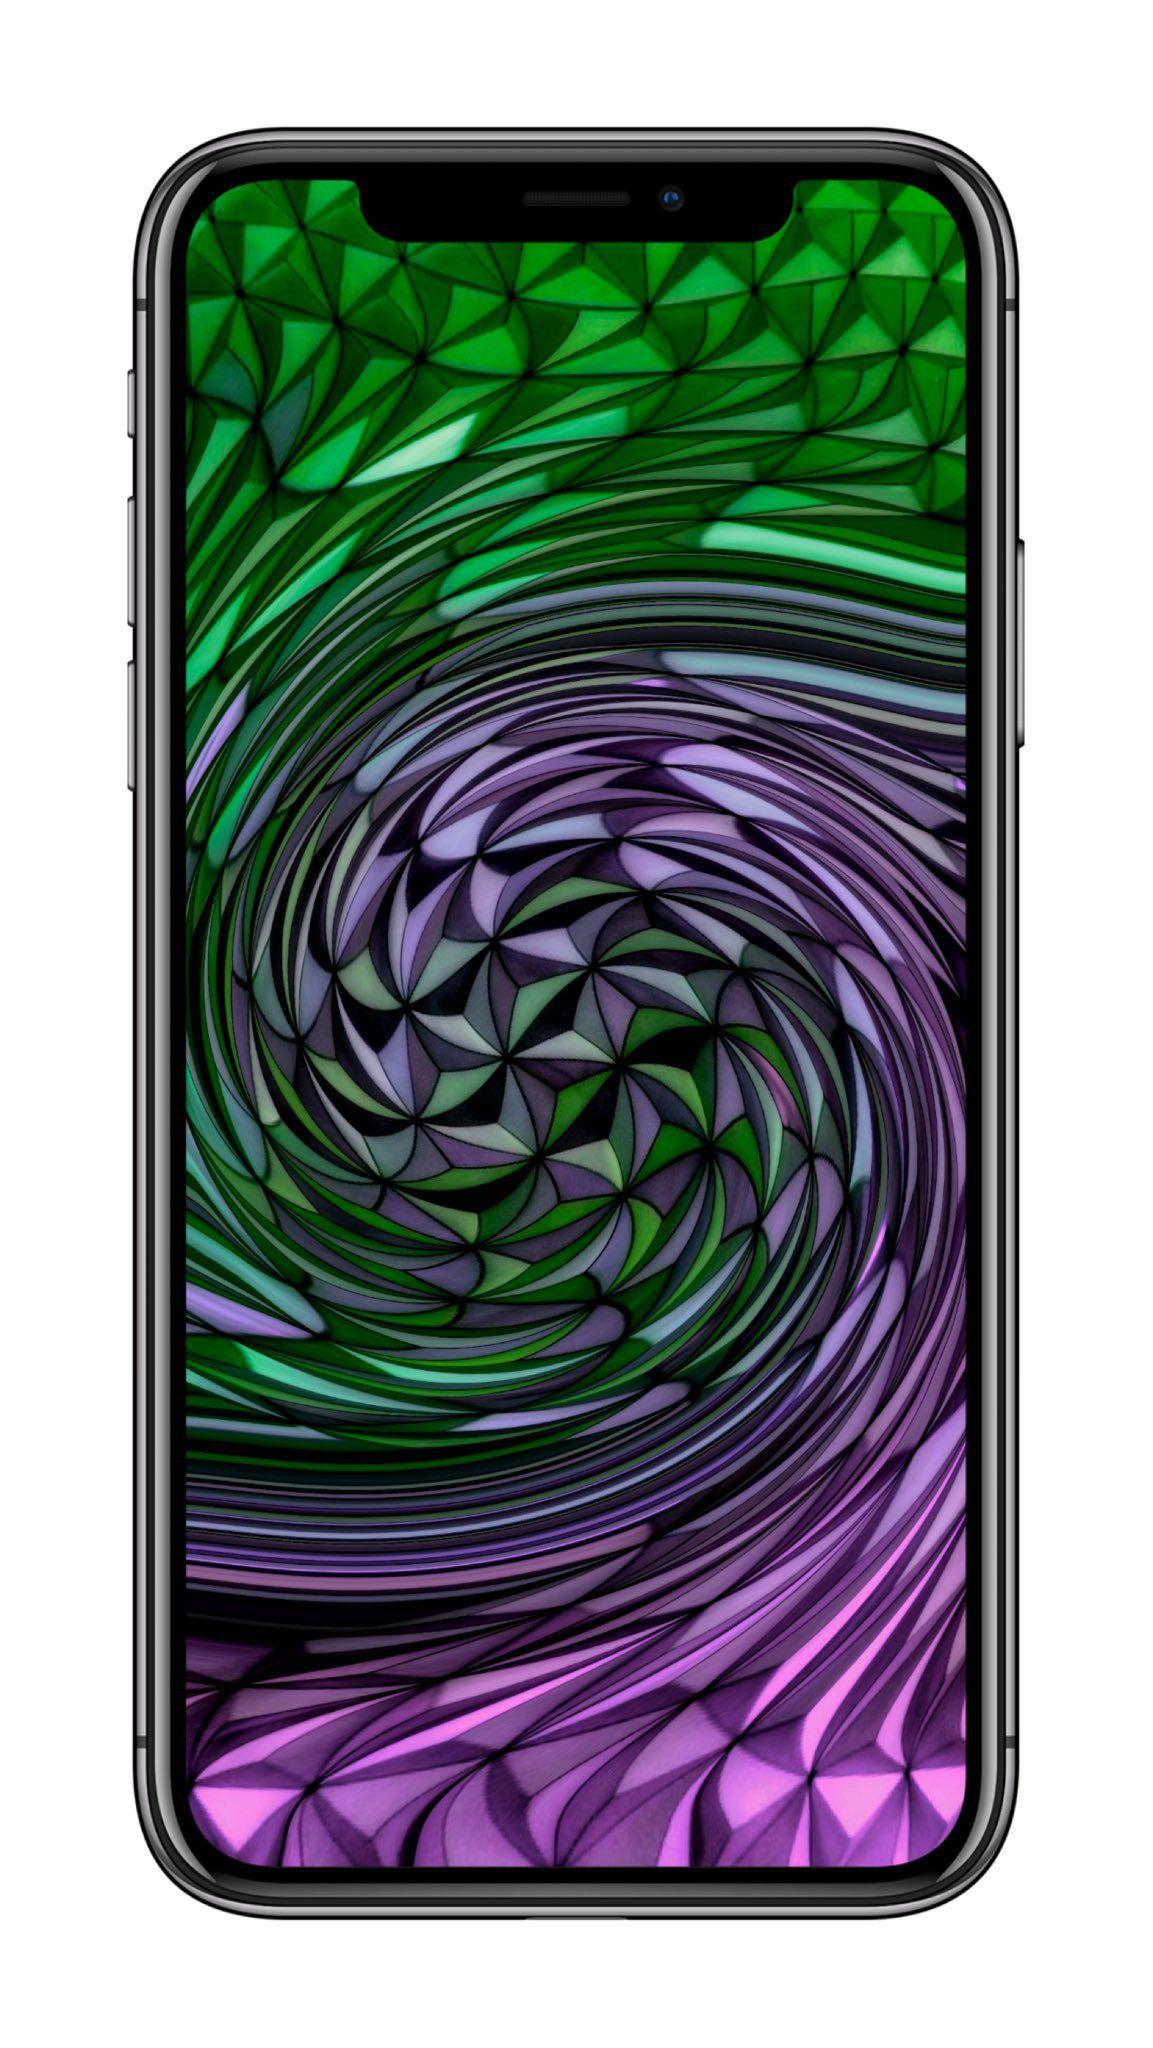 Hotspot4U on Graphic wallpaper, Homescreen, Iphone wallpaper